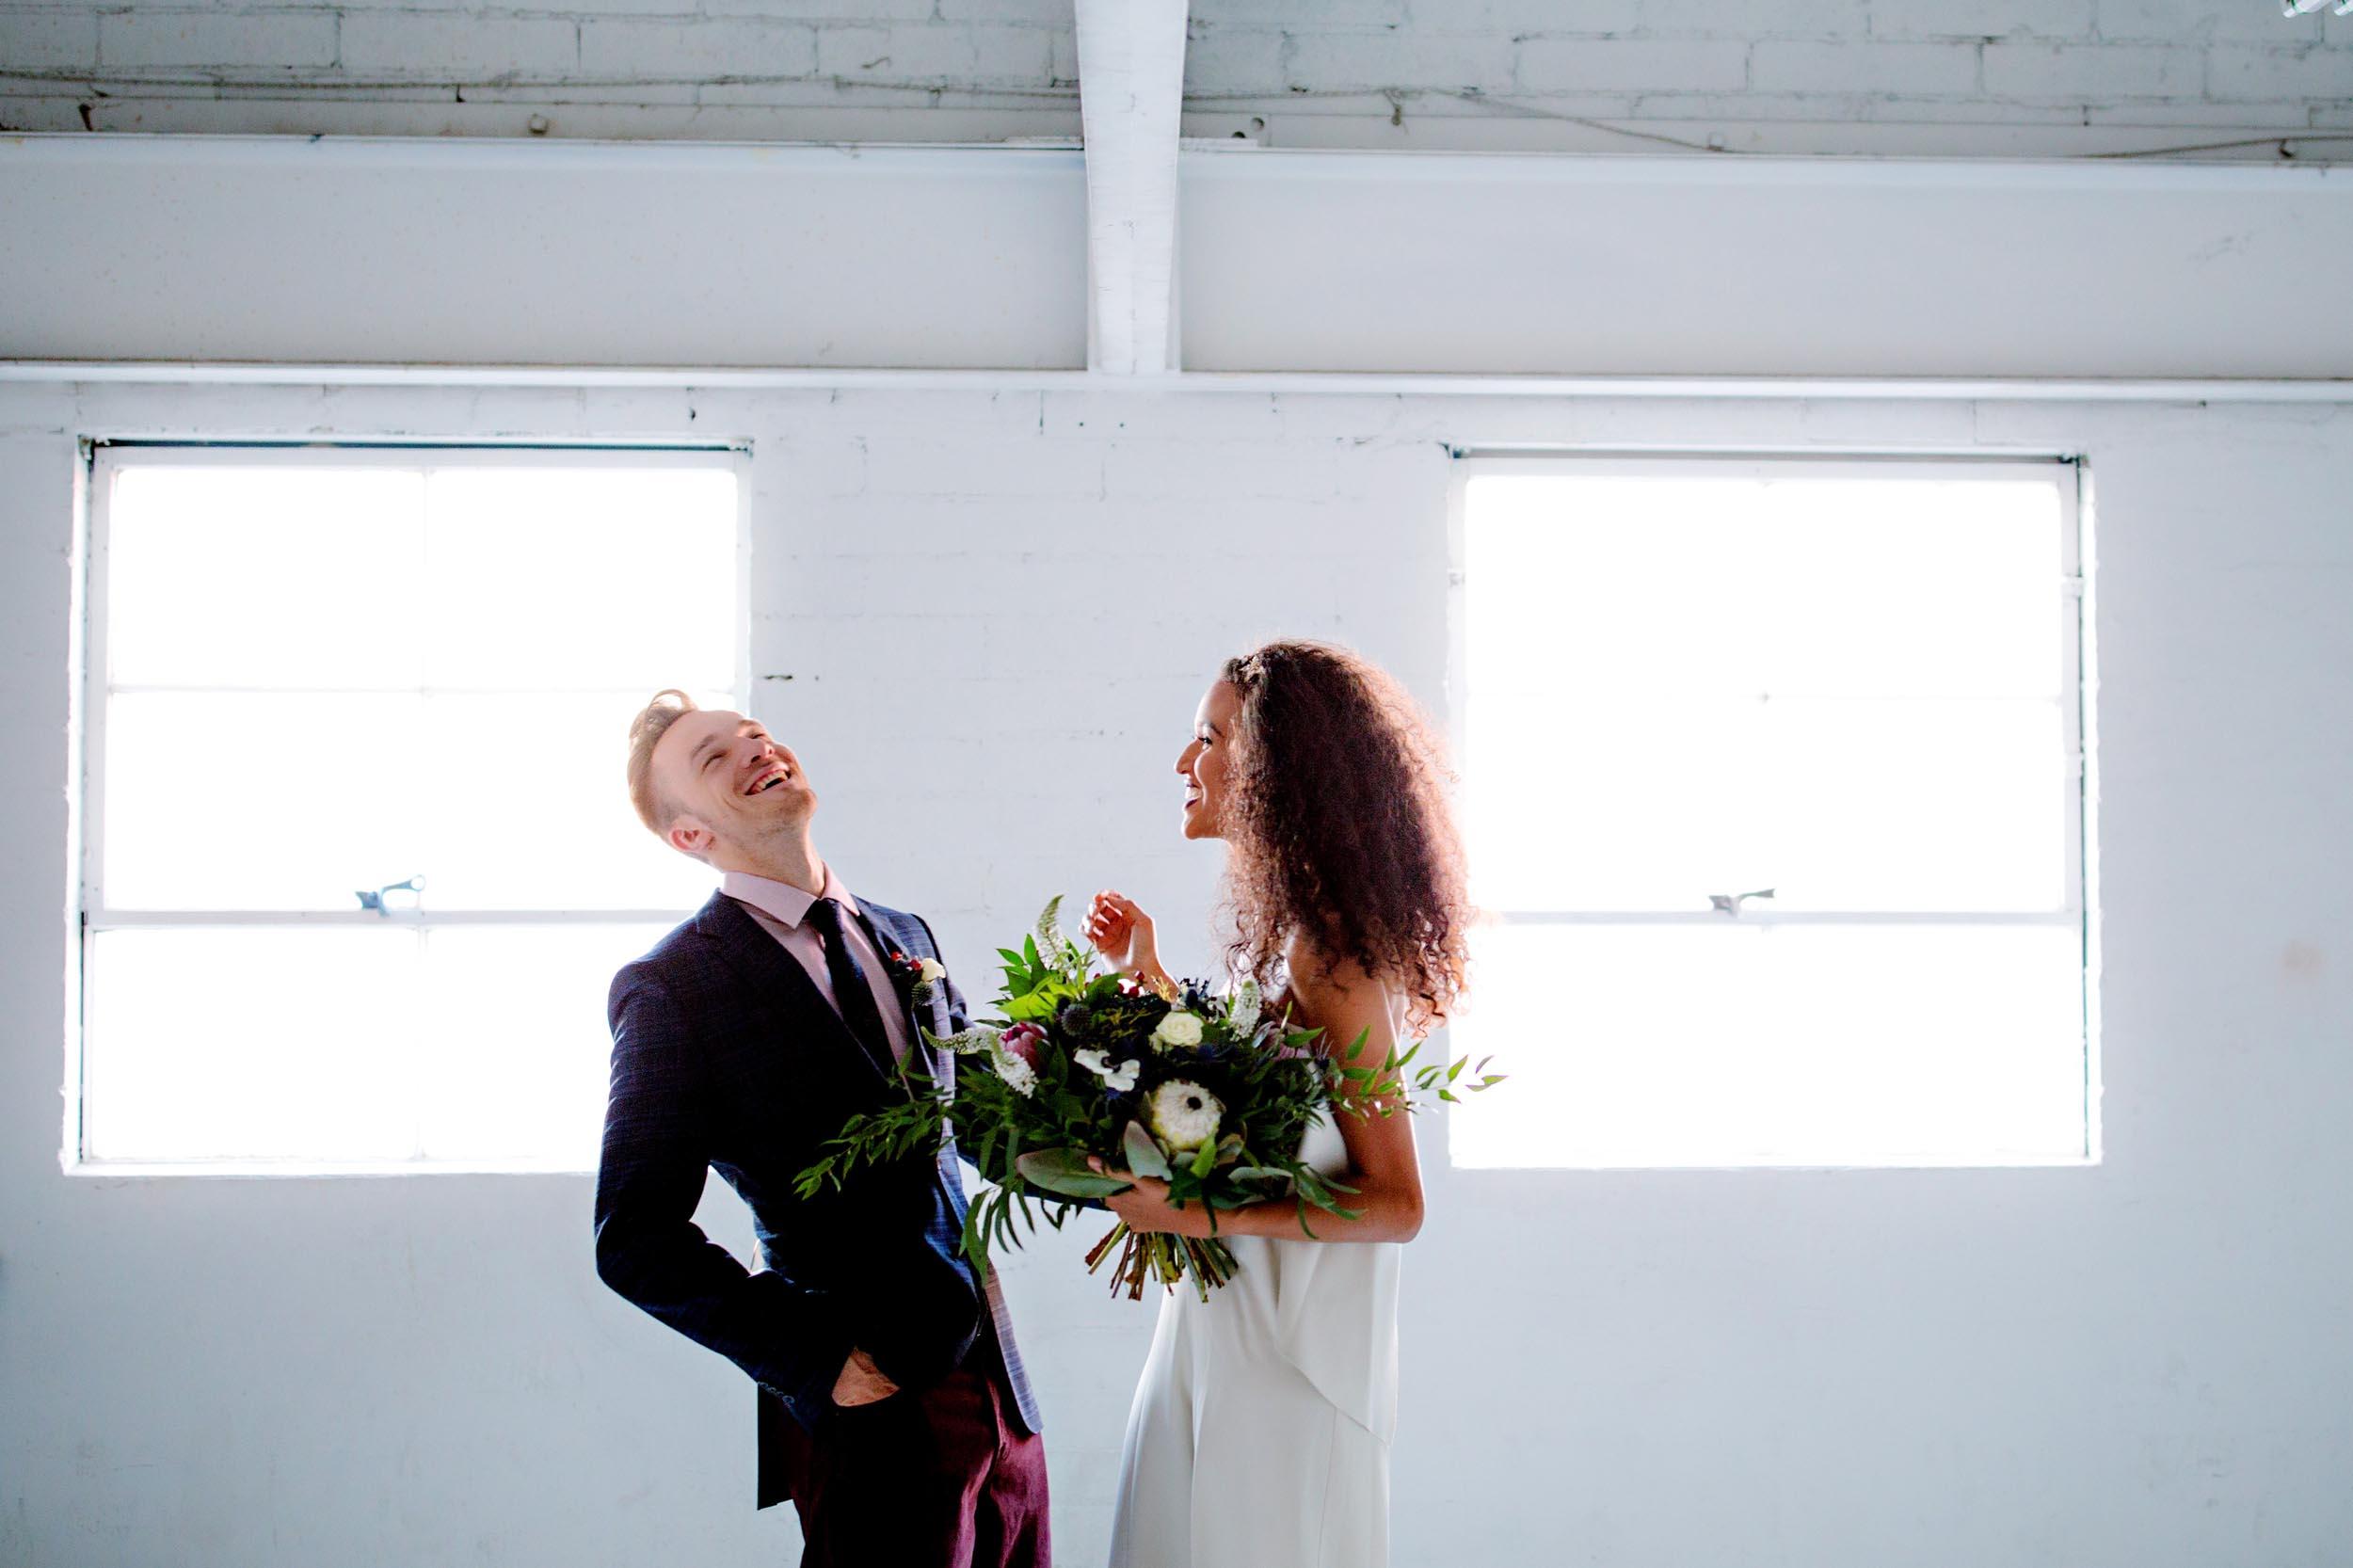 weddings-starsstripes-33.jpg